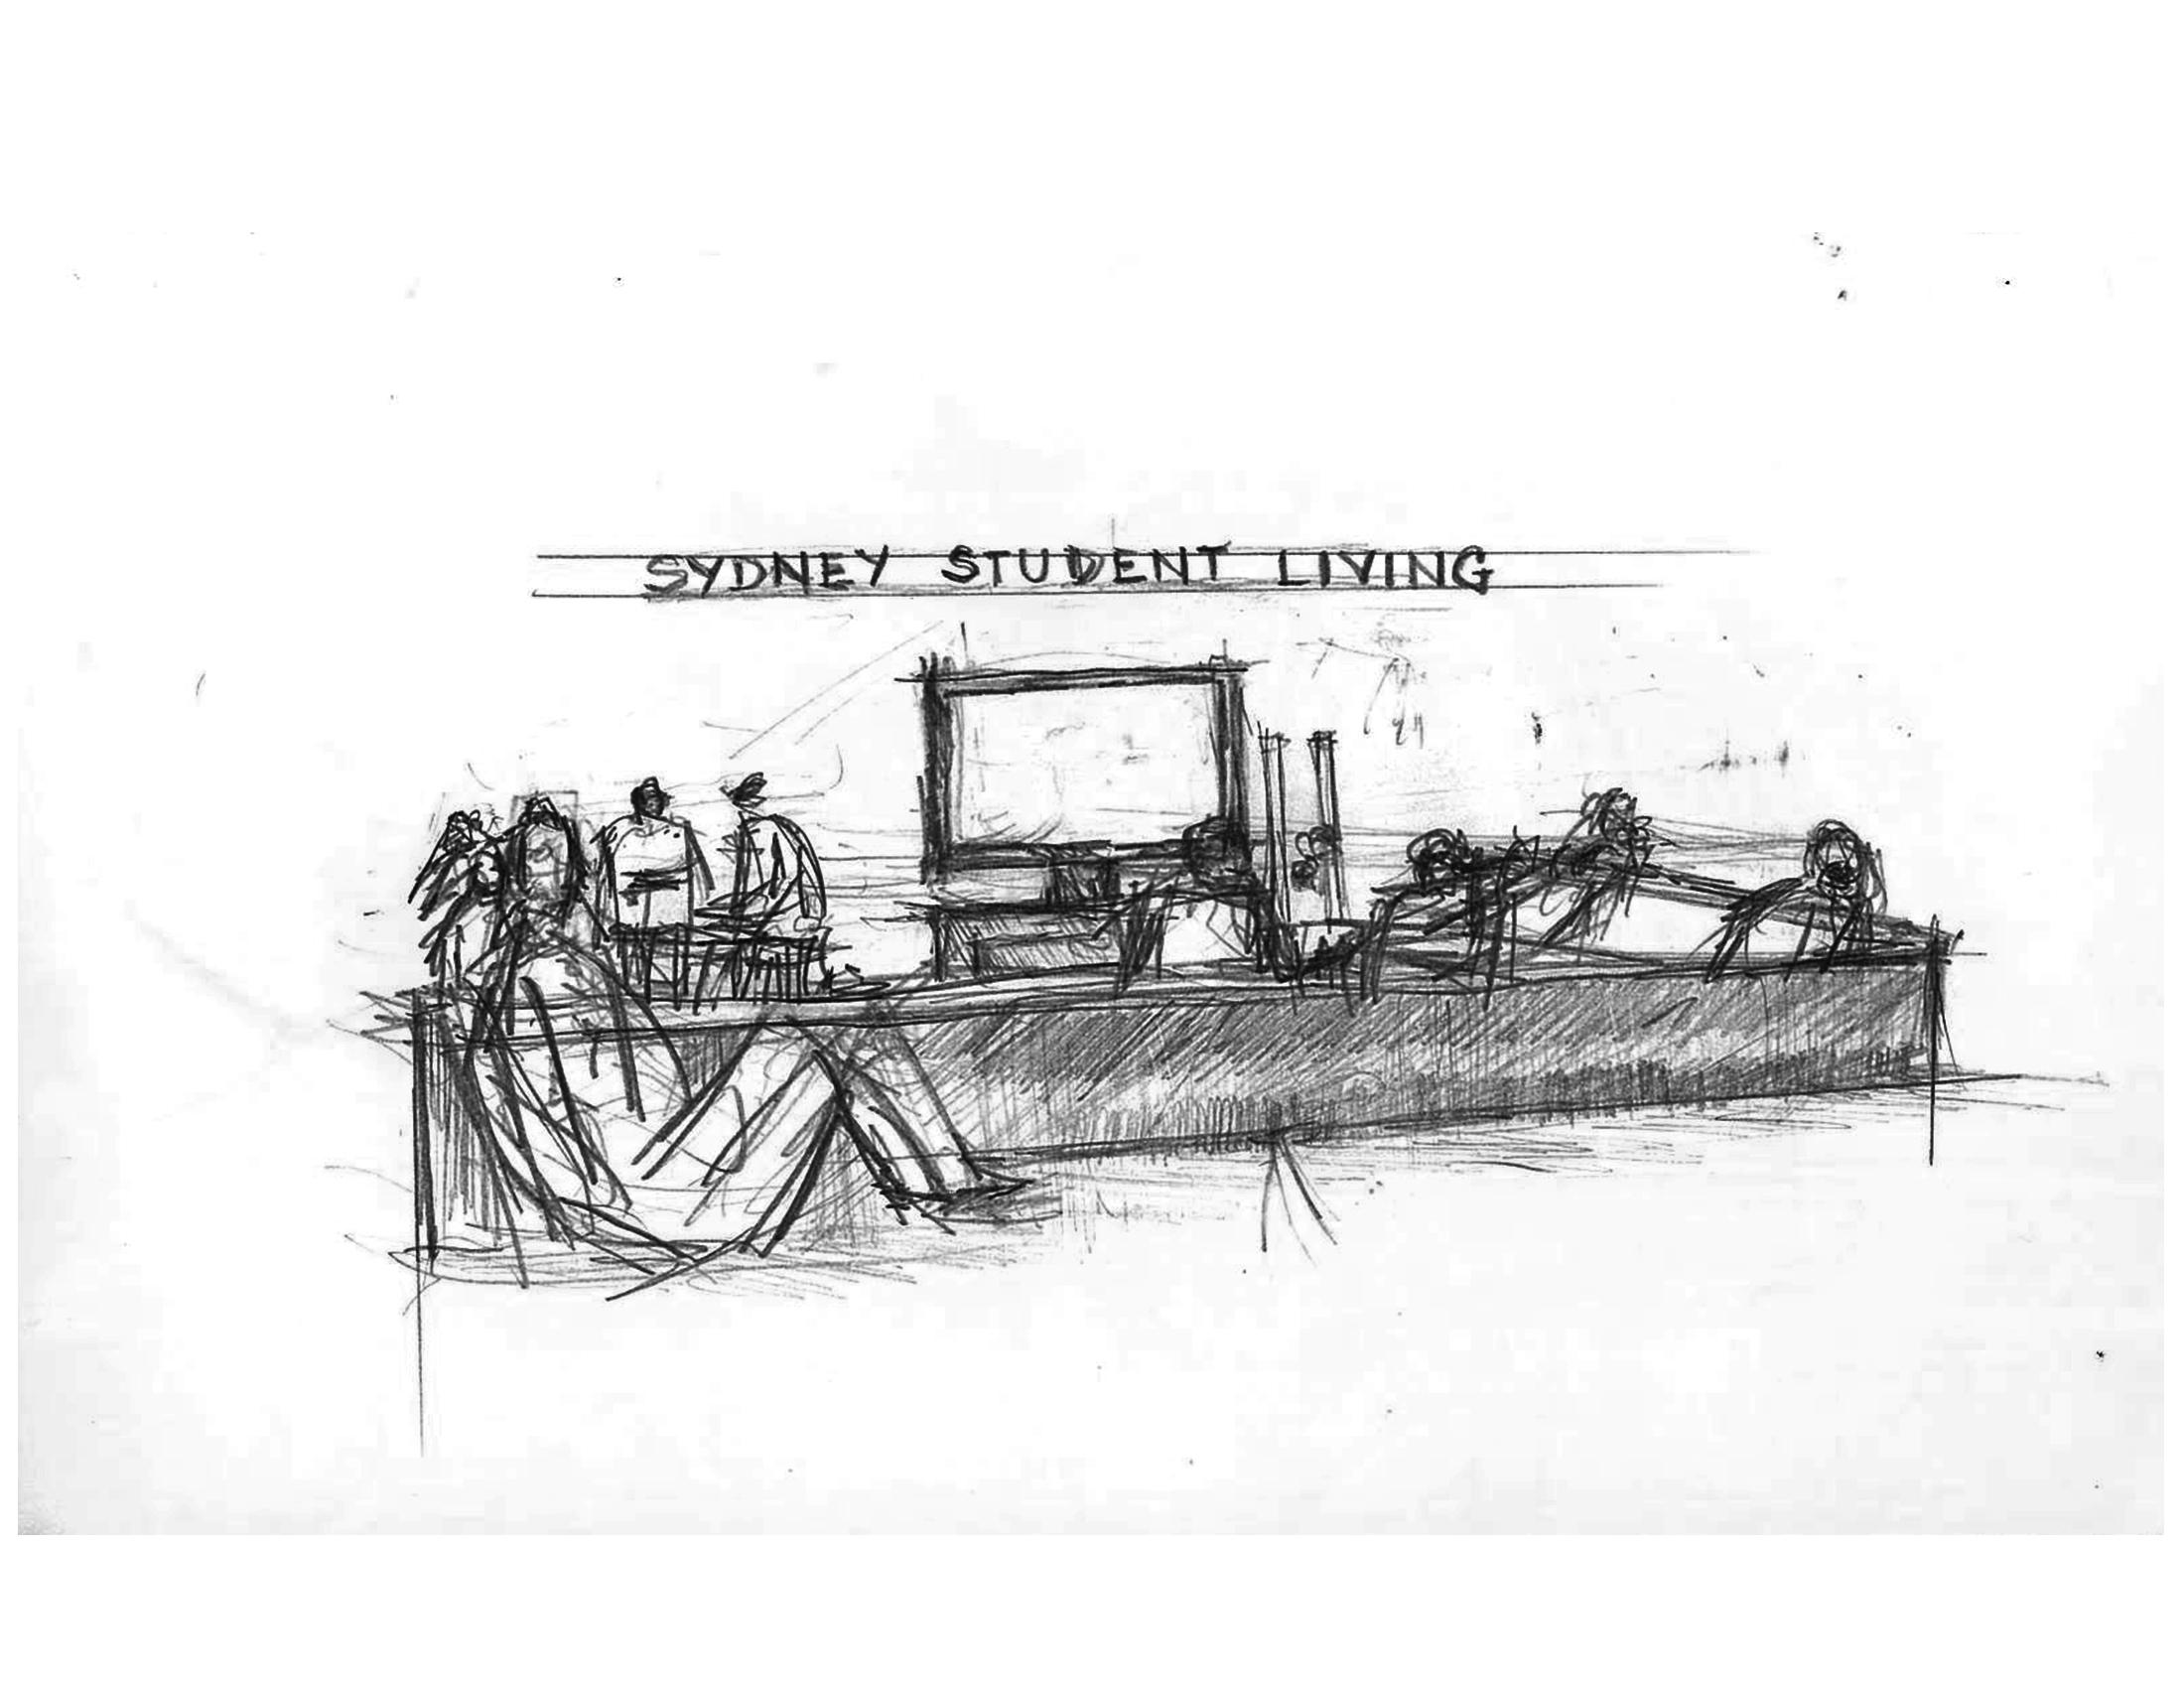 Sydney Student-Living.jpg